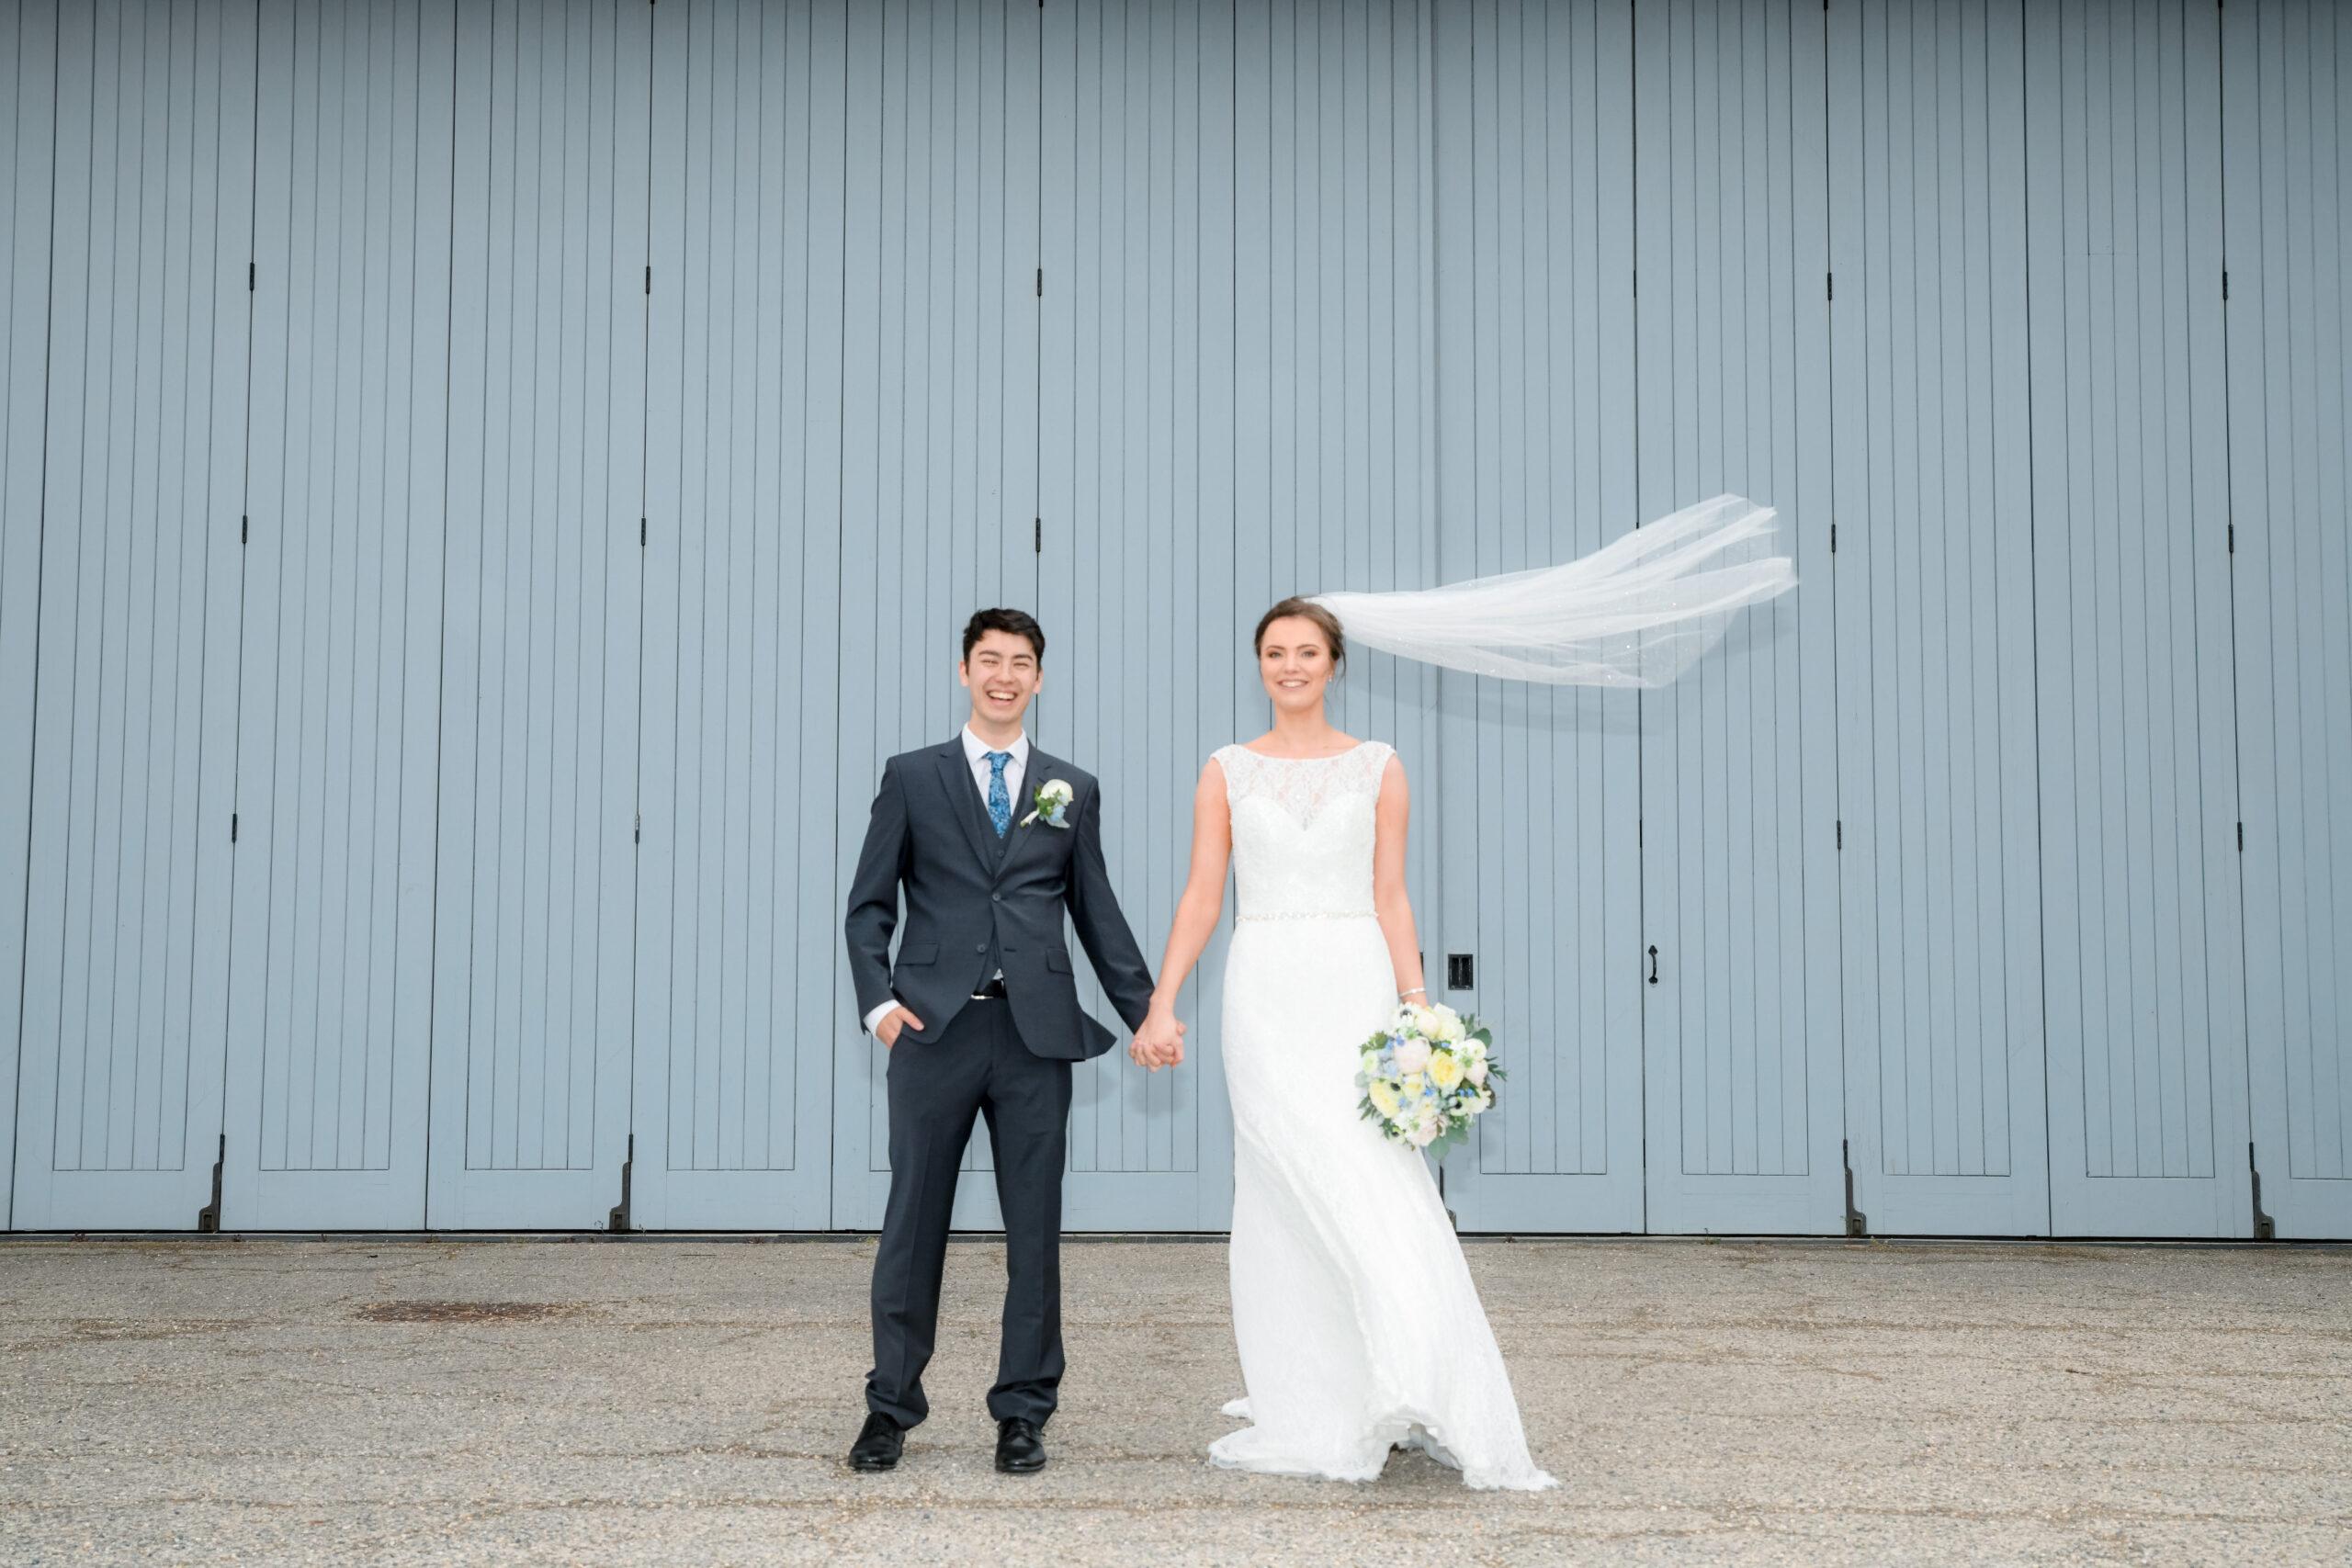 Wedding Photographer The Aviator Farnborough